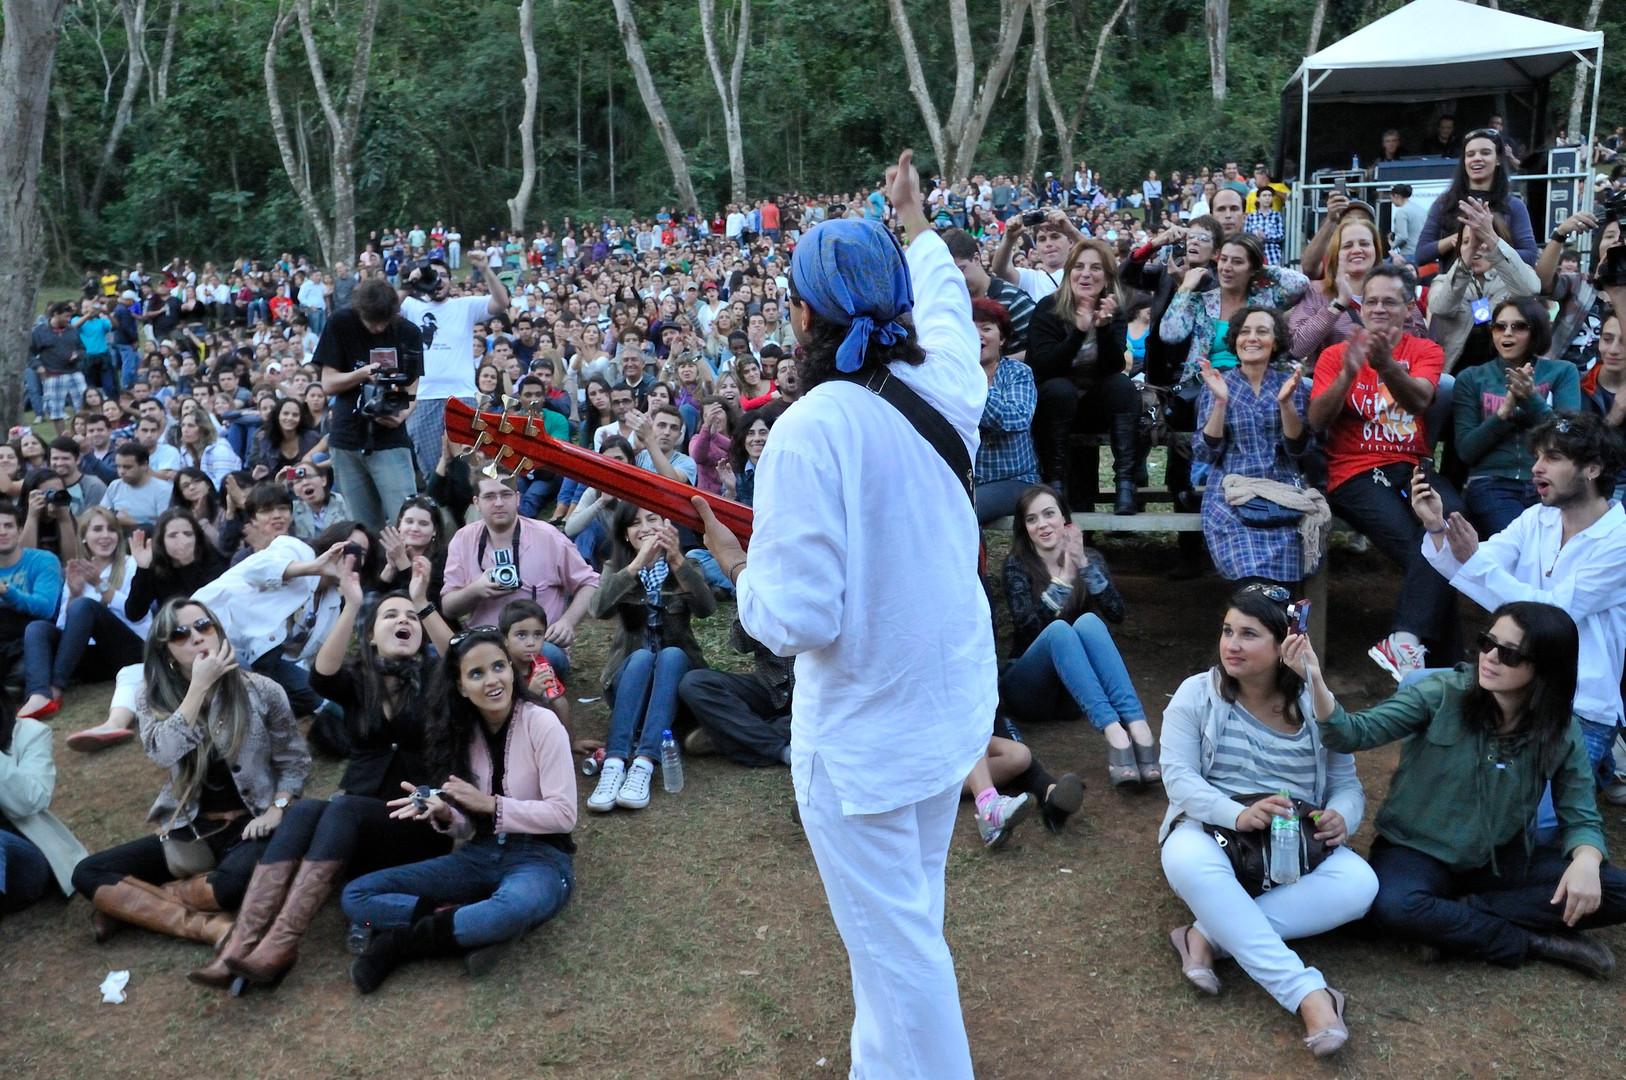 2011.06.19_ViJazz&Blues_Festival_REY3304